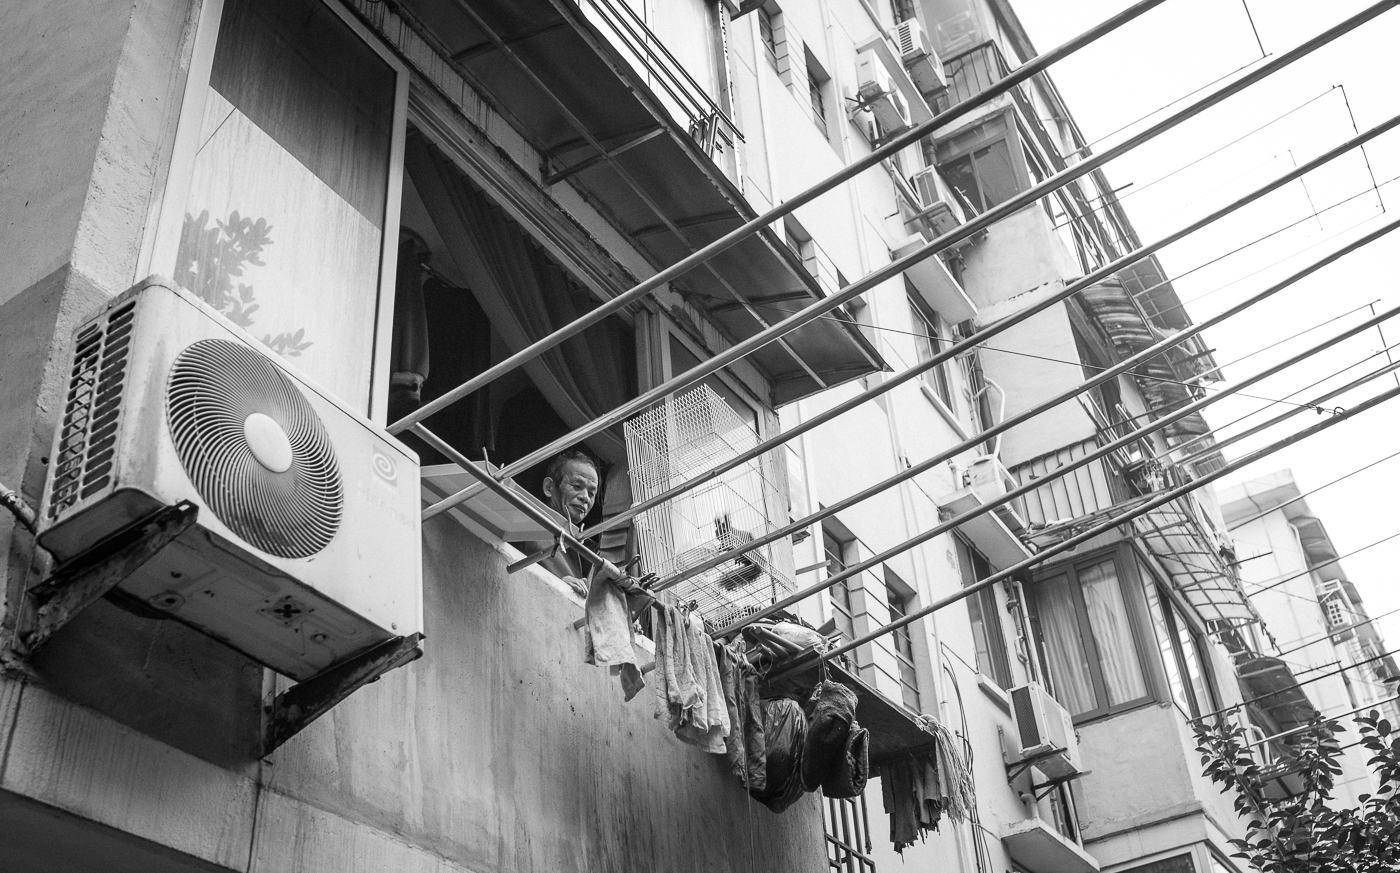 philipp schäbler shanghai china-3783.jpg